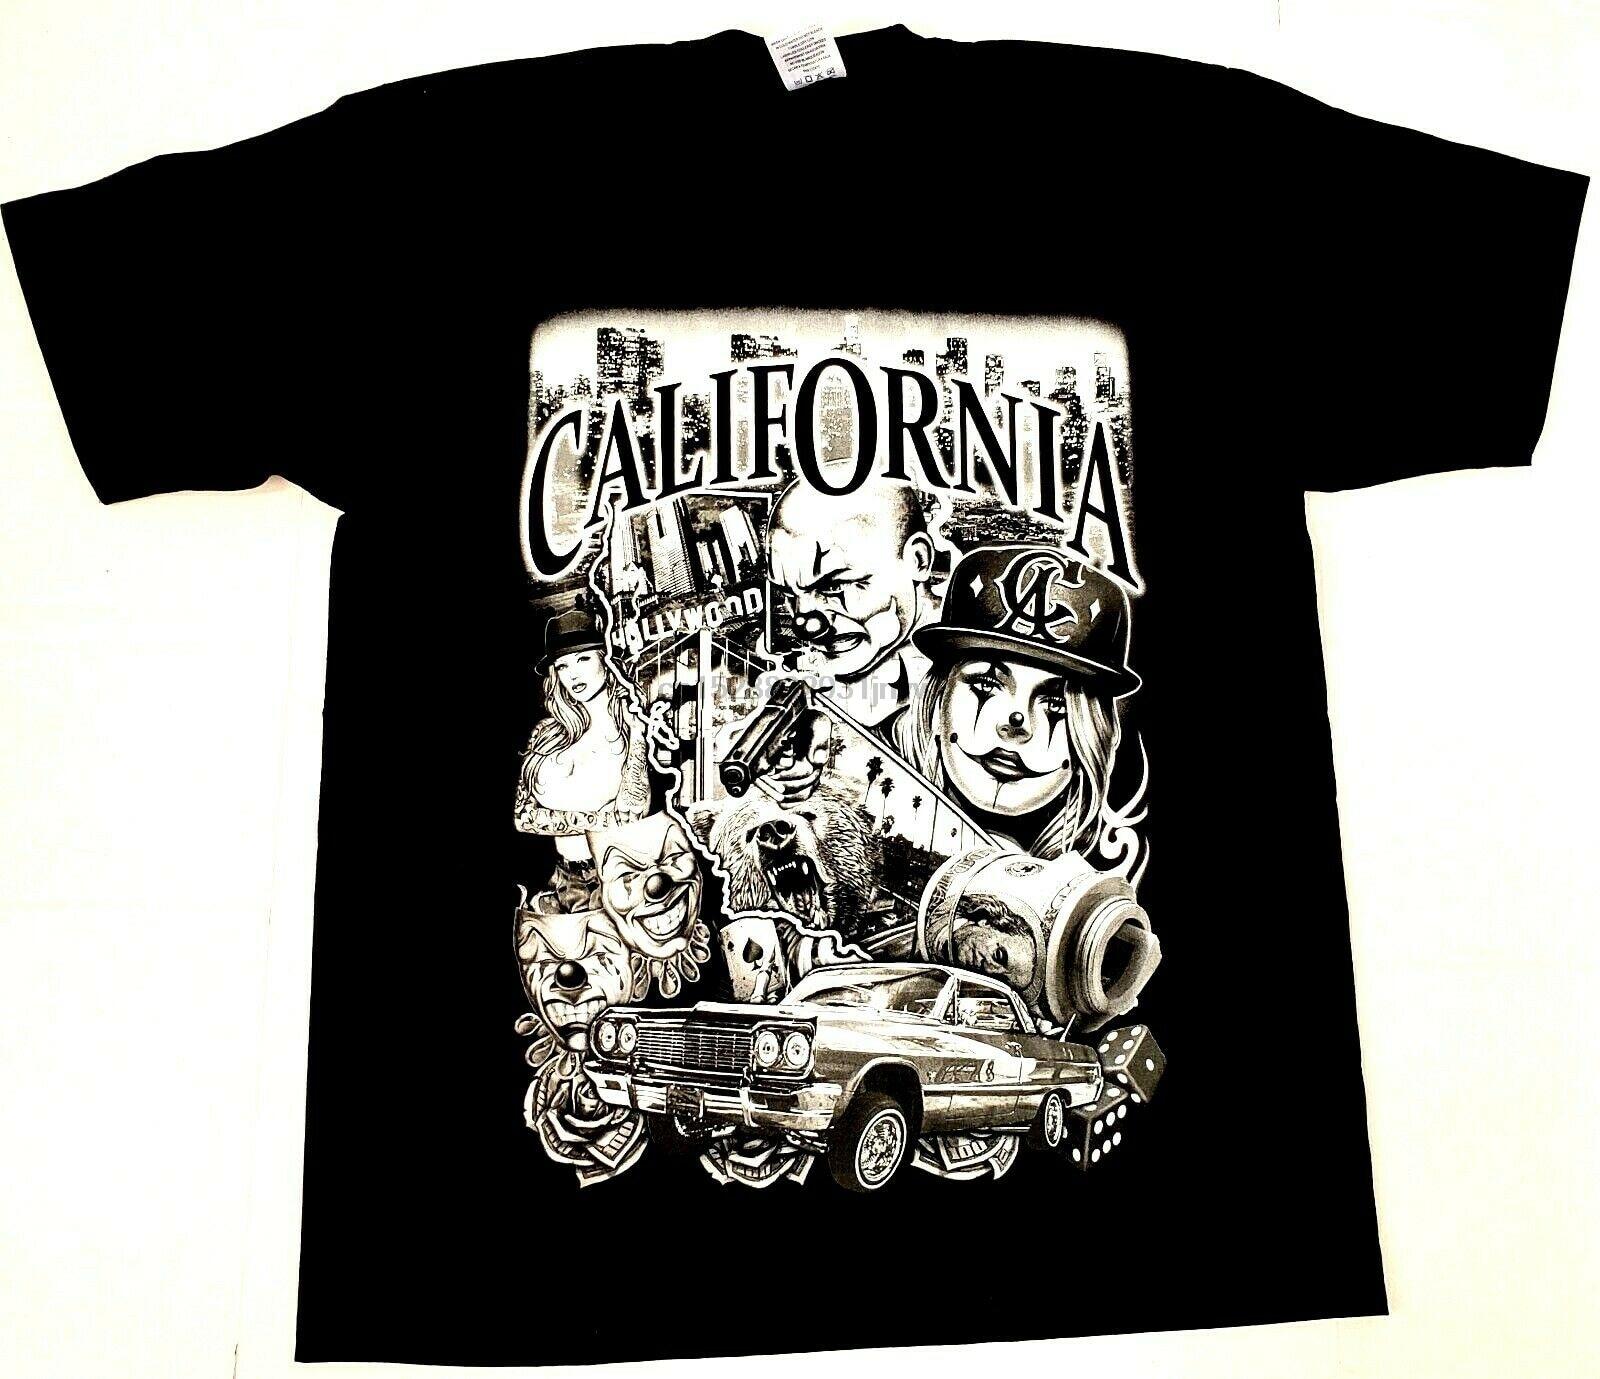 CALIFORNIA LOWRIDER T-shirt Cali Stay Low Urban Streetwear Adult Mens Tee New